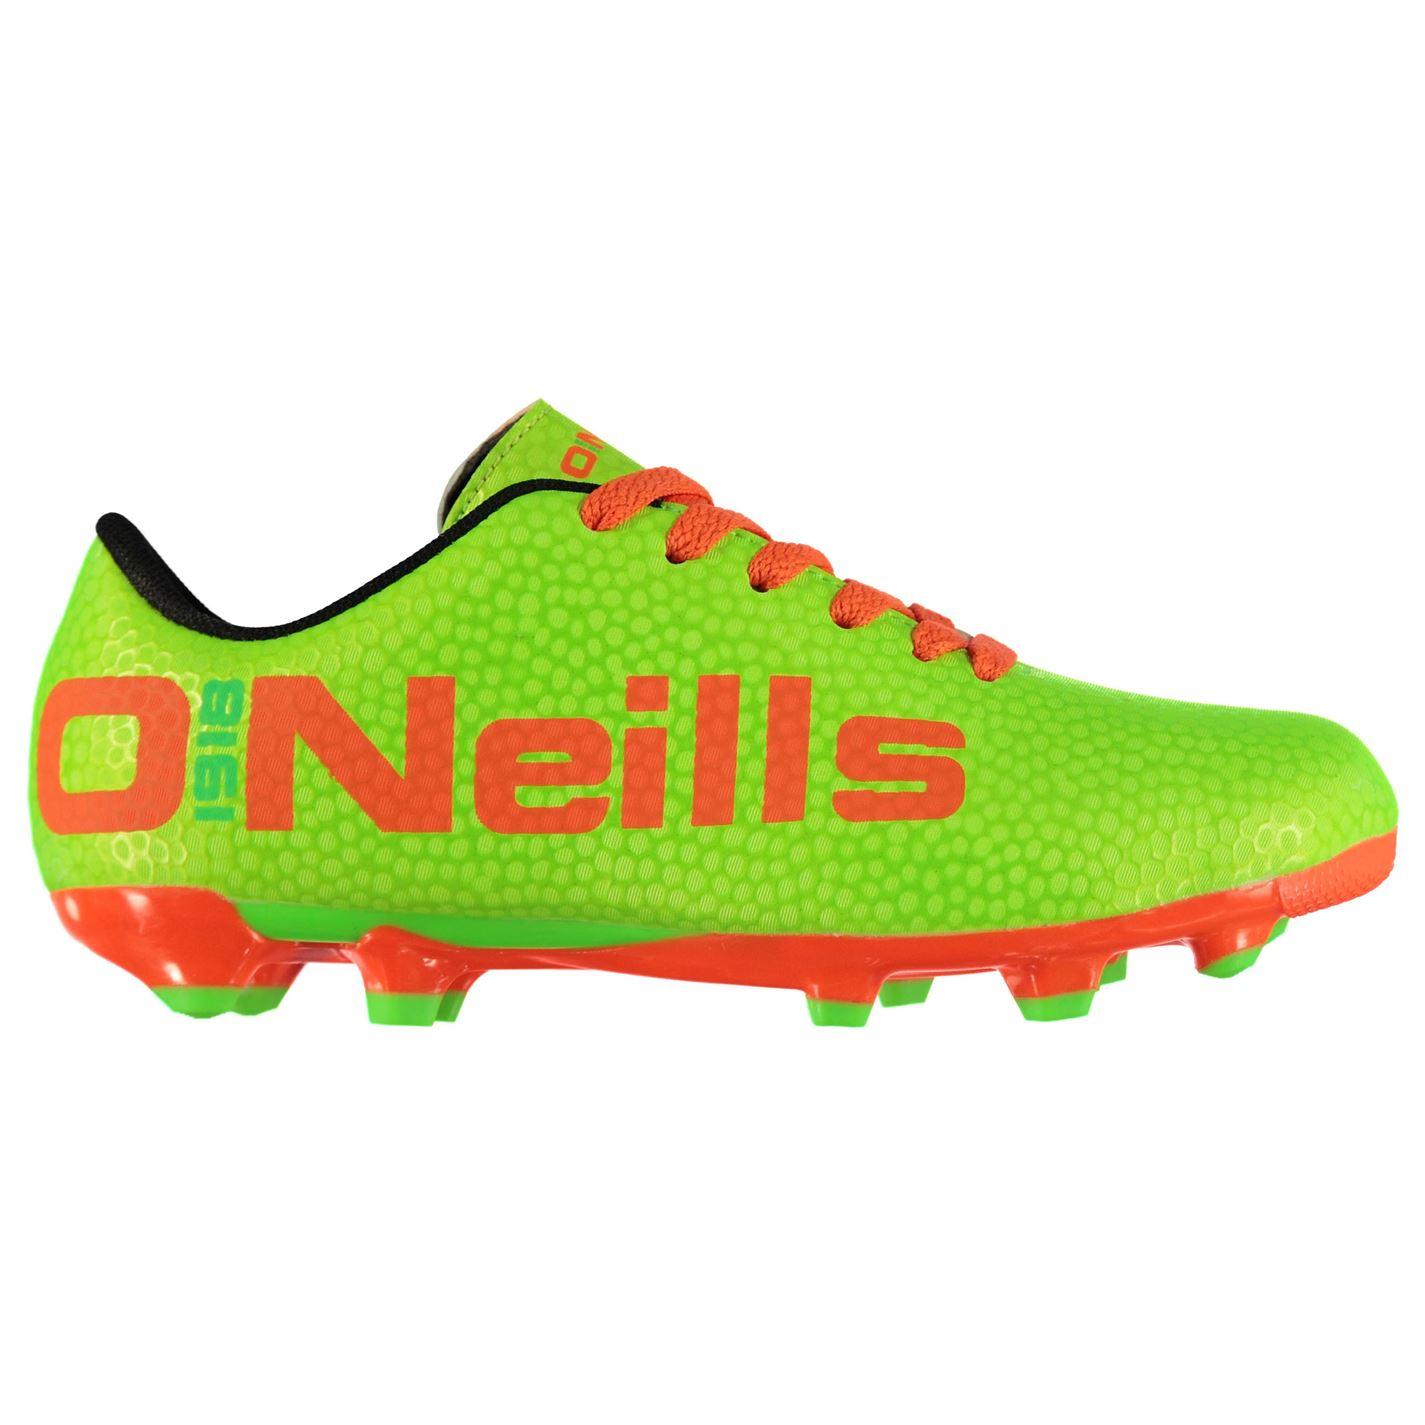 ONeills Apollo II Junior FG Football Boots